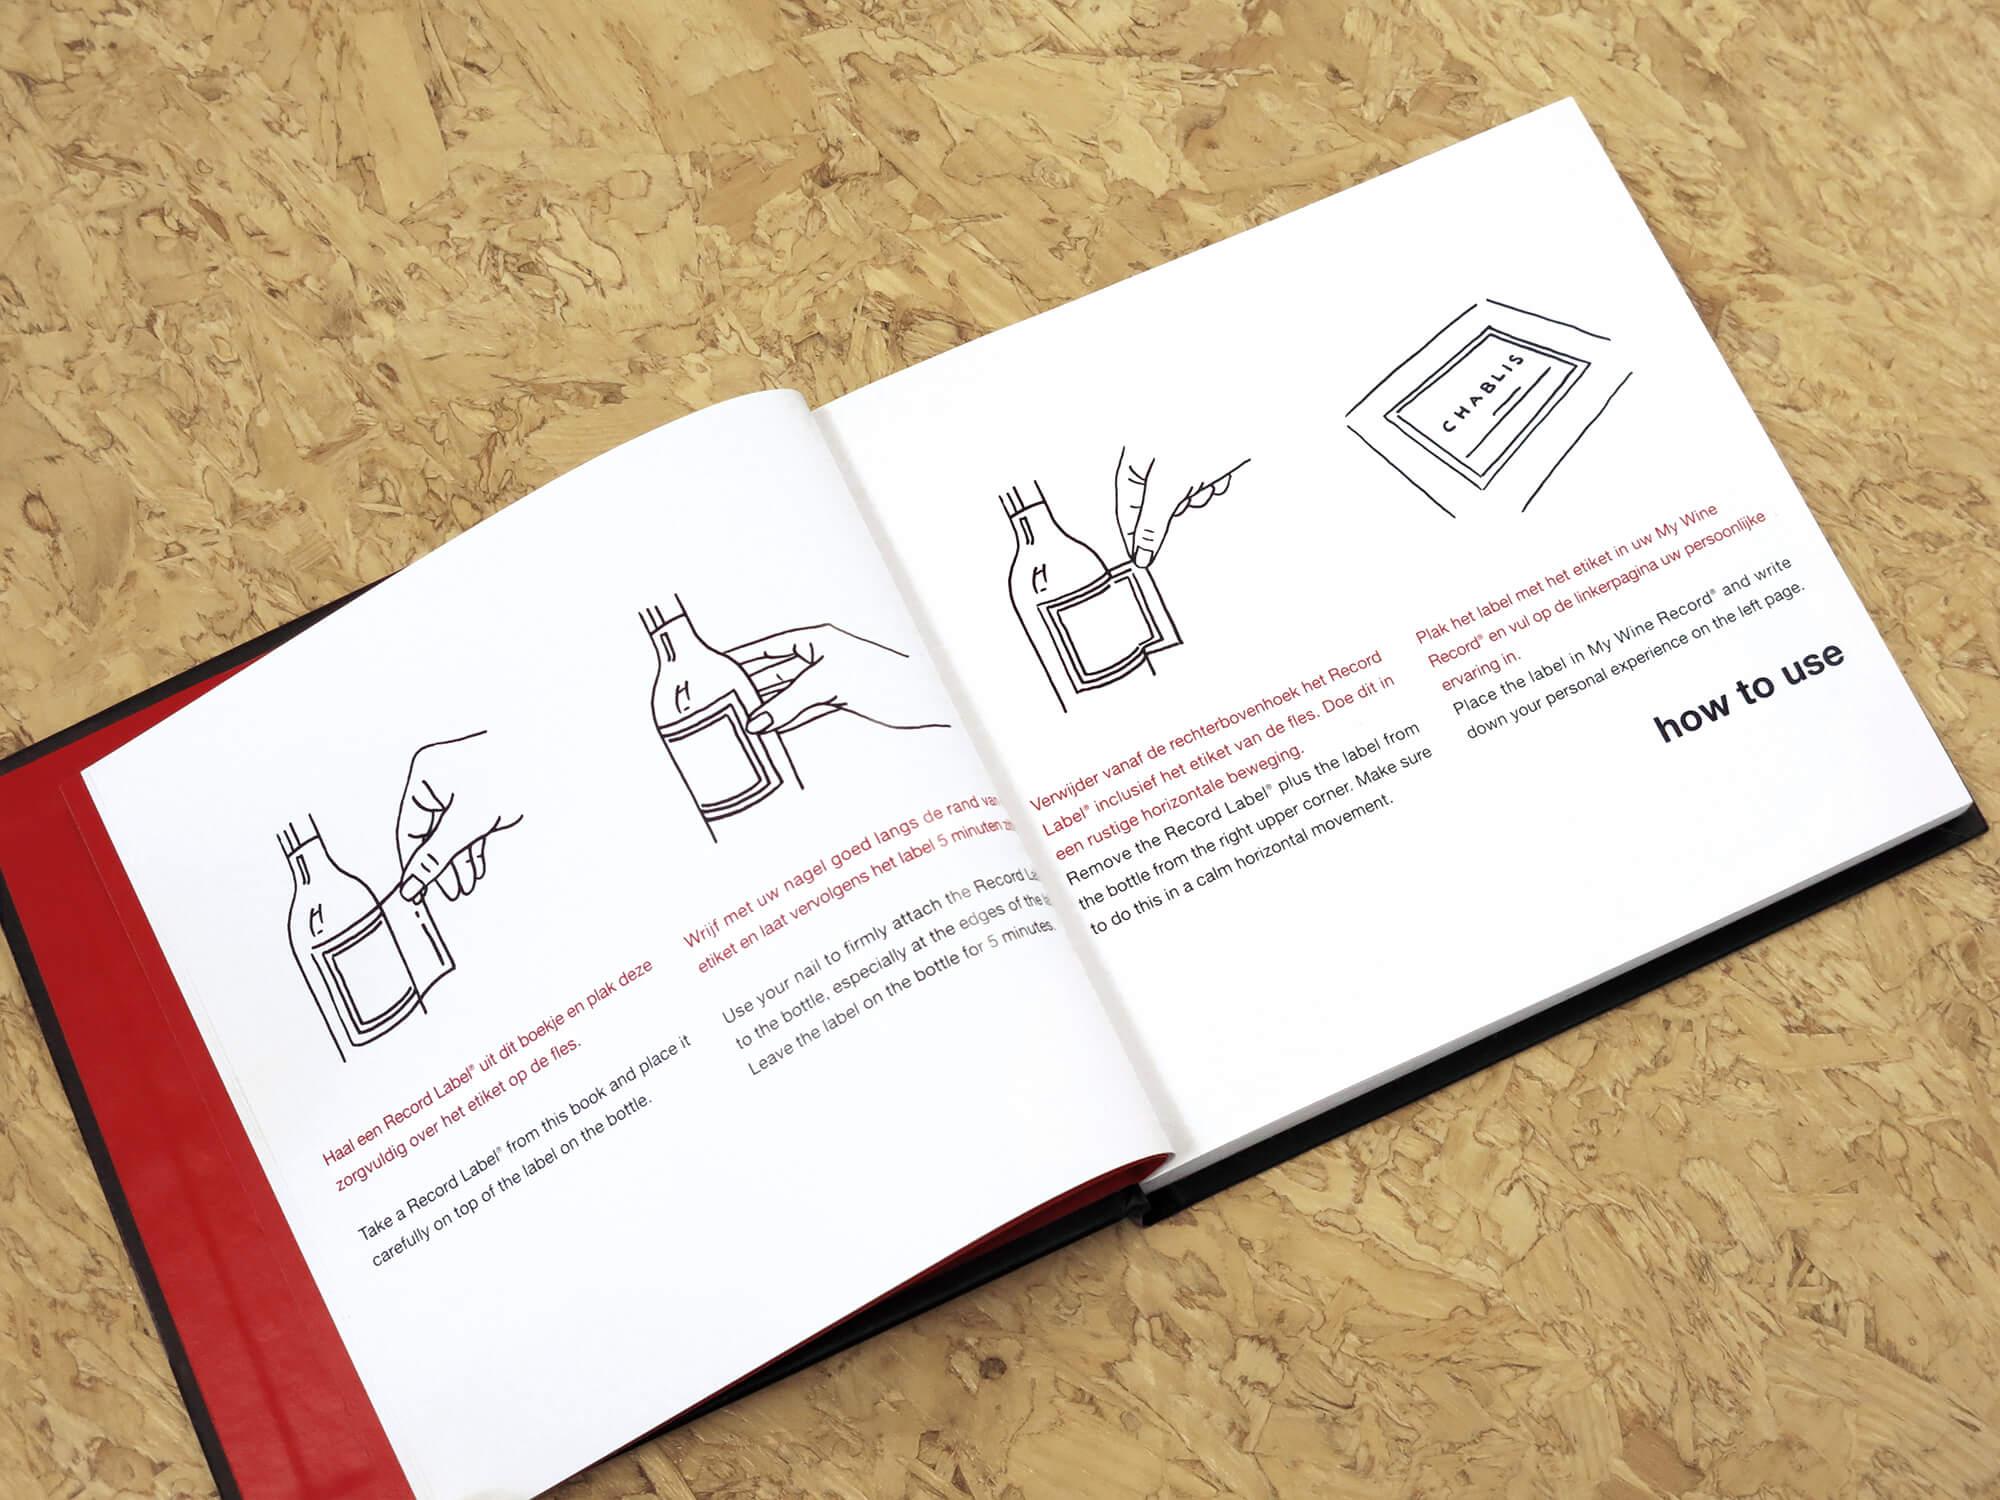 kapowski_mywinerecord_book_4